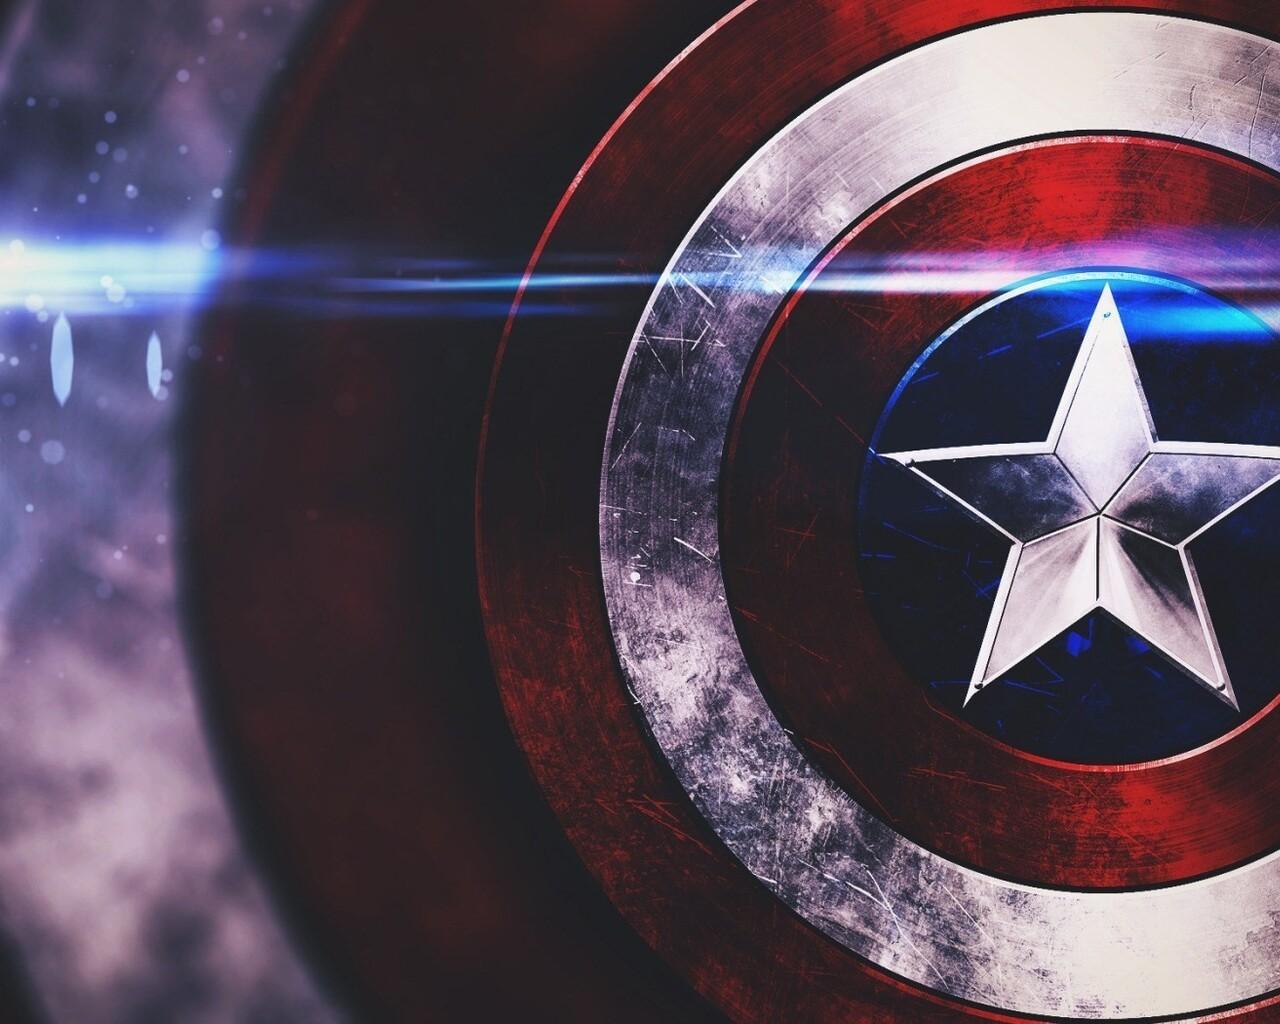 1280x1024 Captain America Shield 1280x1024 Resolution HD ...